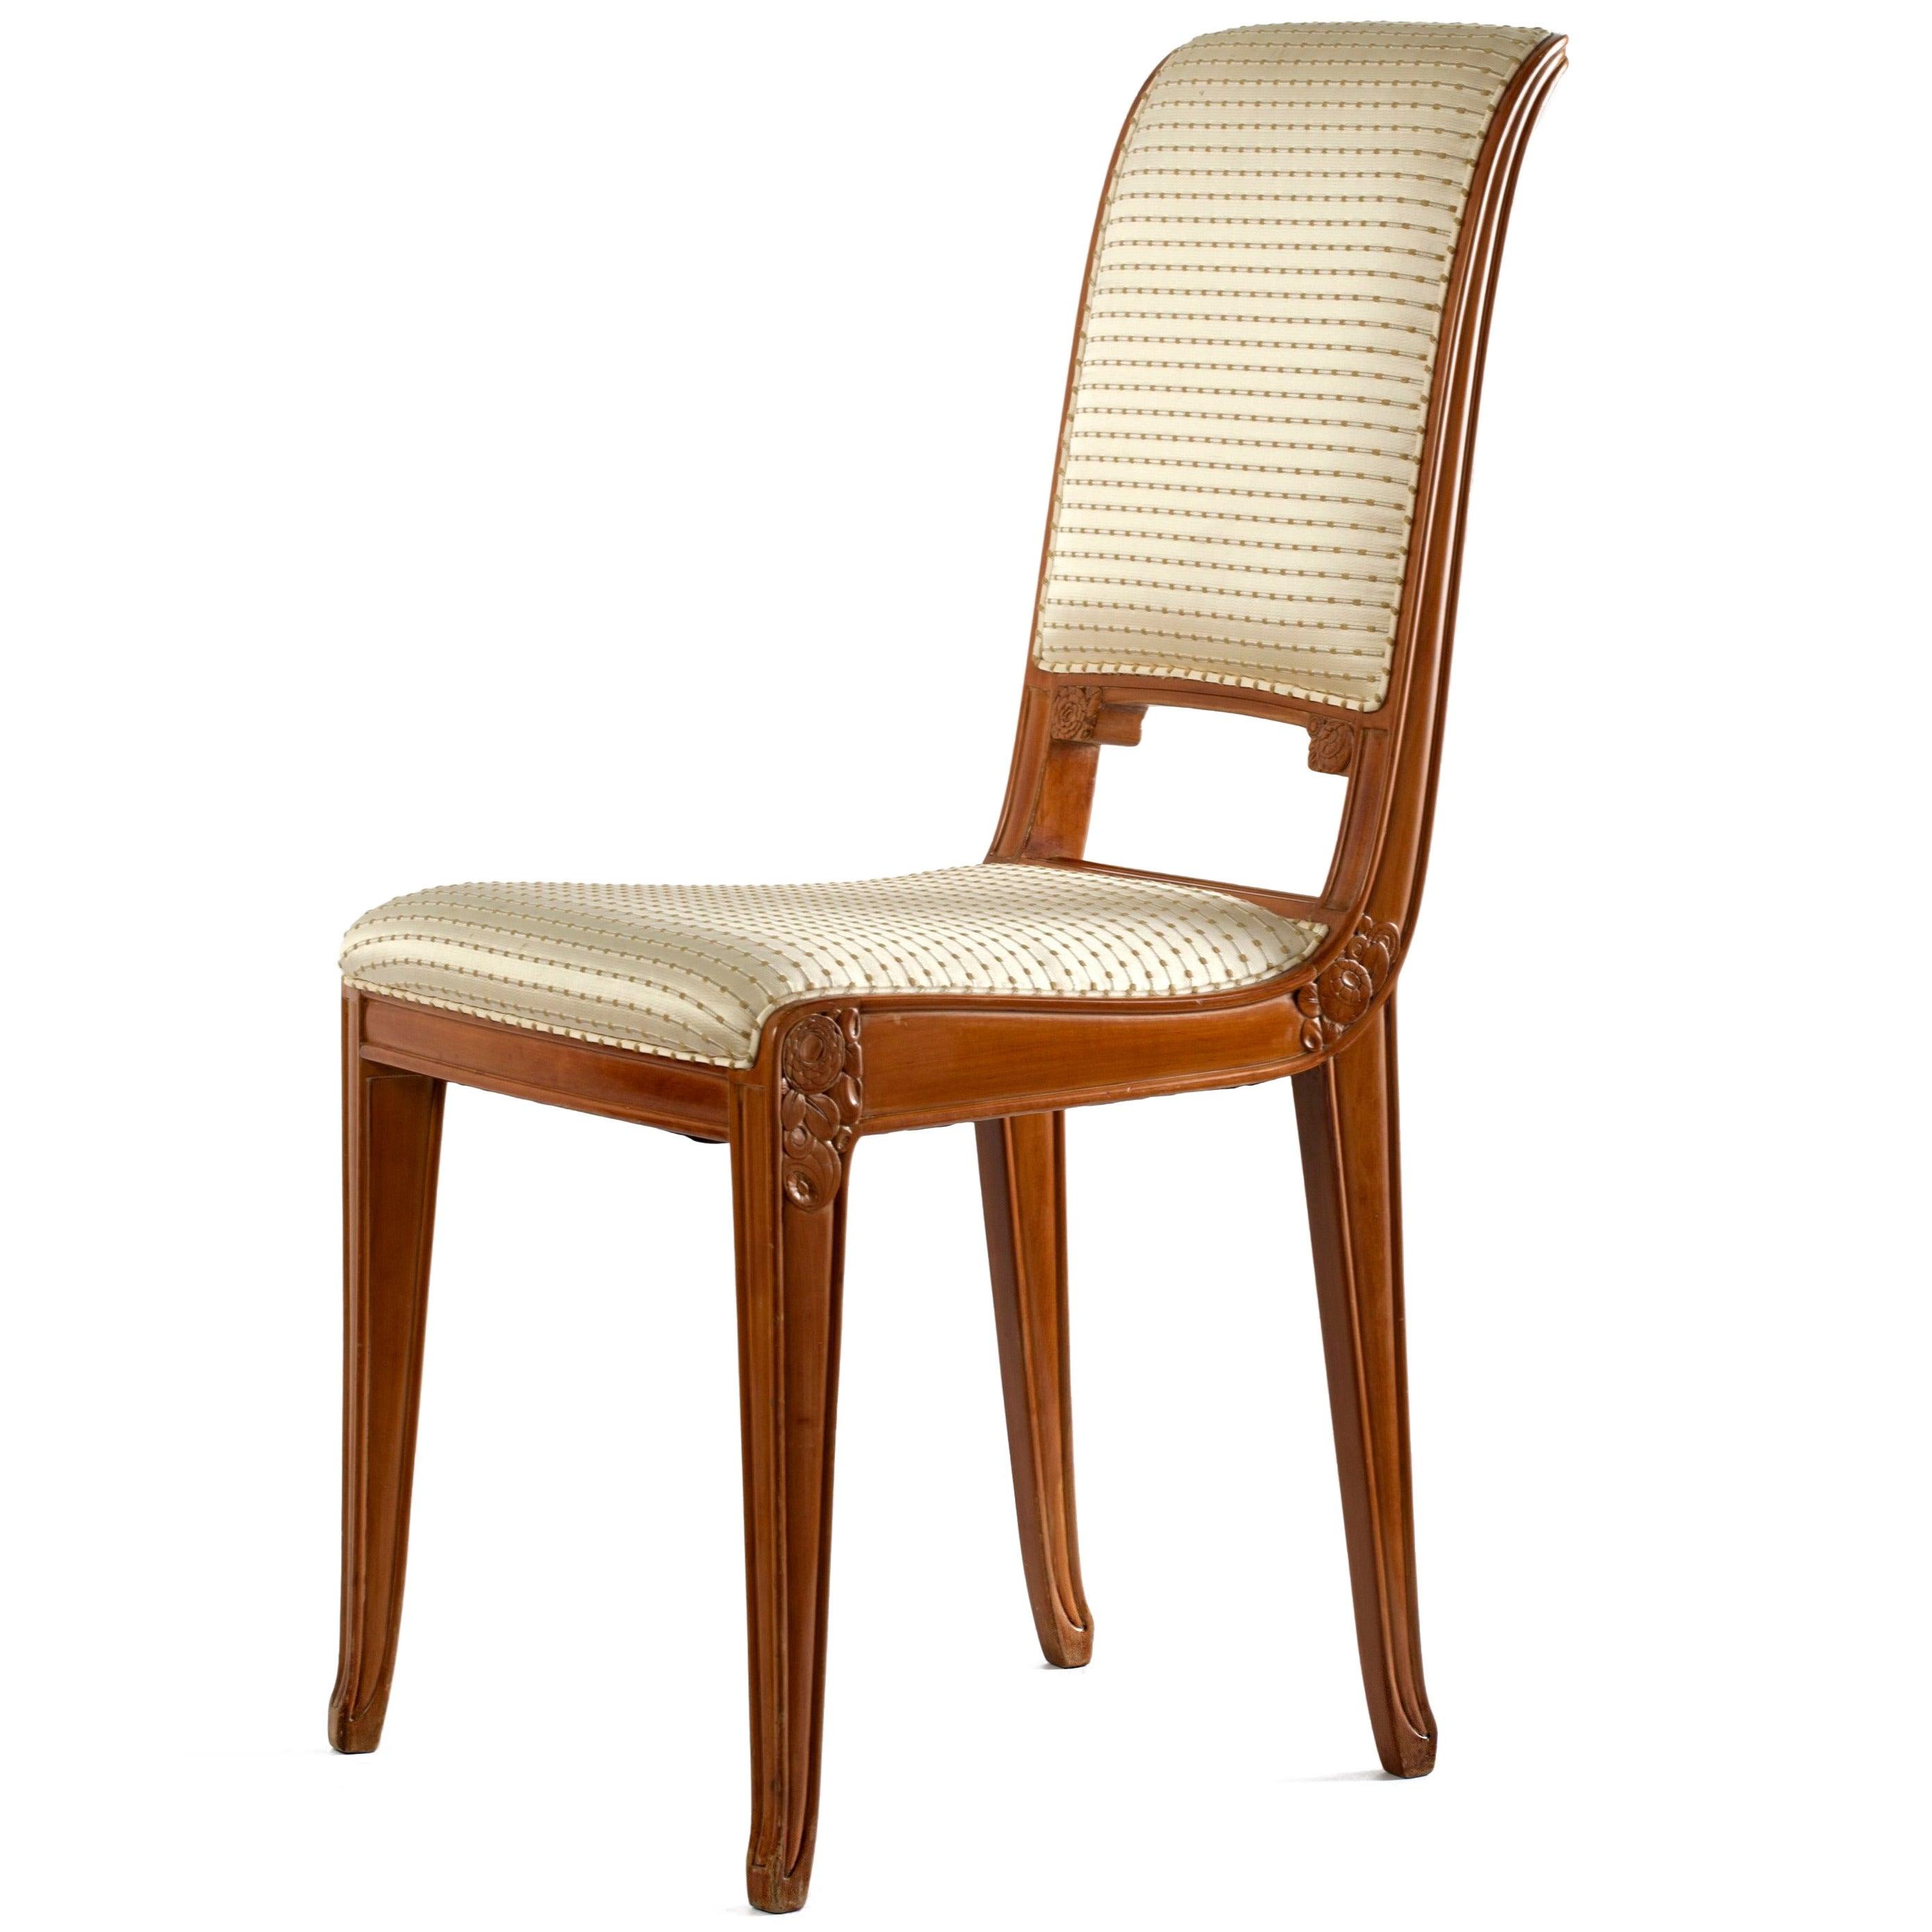 Léon Jallot, Early Art Deco Side chair, France, c. 1922